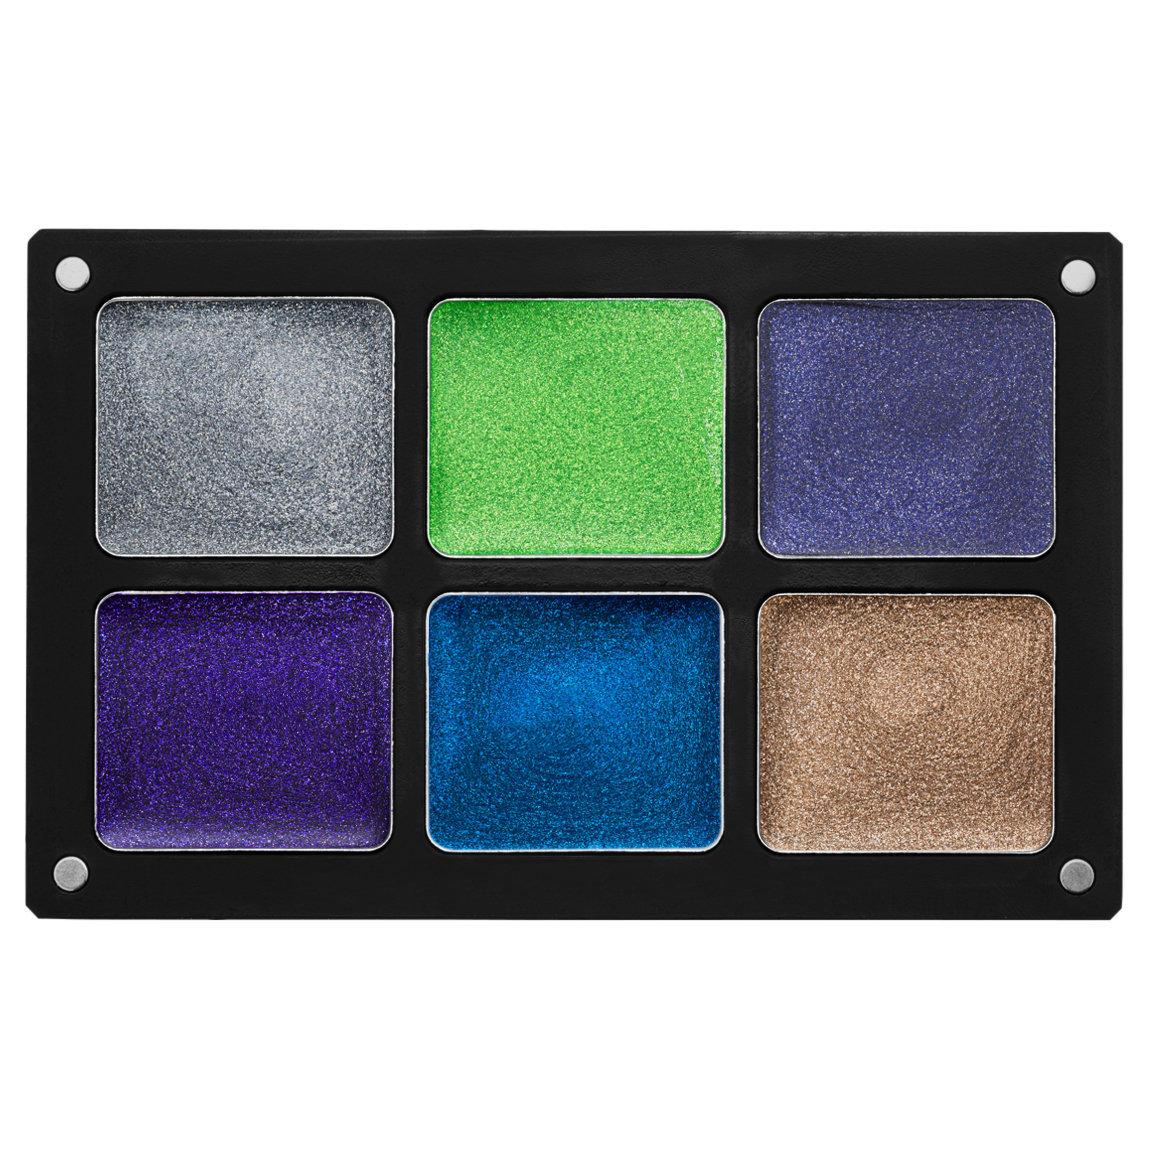 Danessa Myricks Beauty Waterproof Cream Palette Future Is Female alternative view 1 - product swatch.